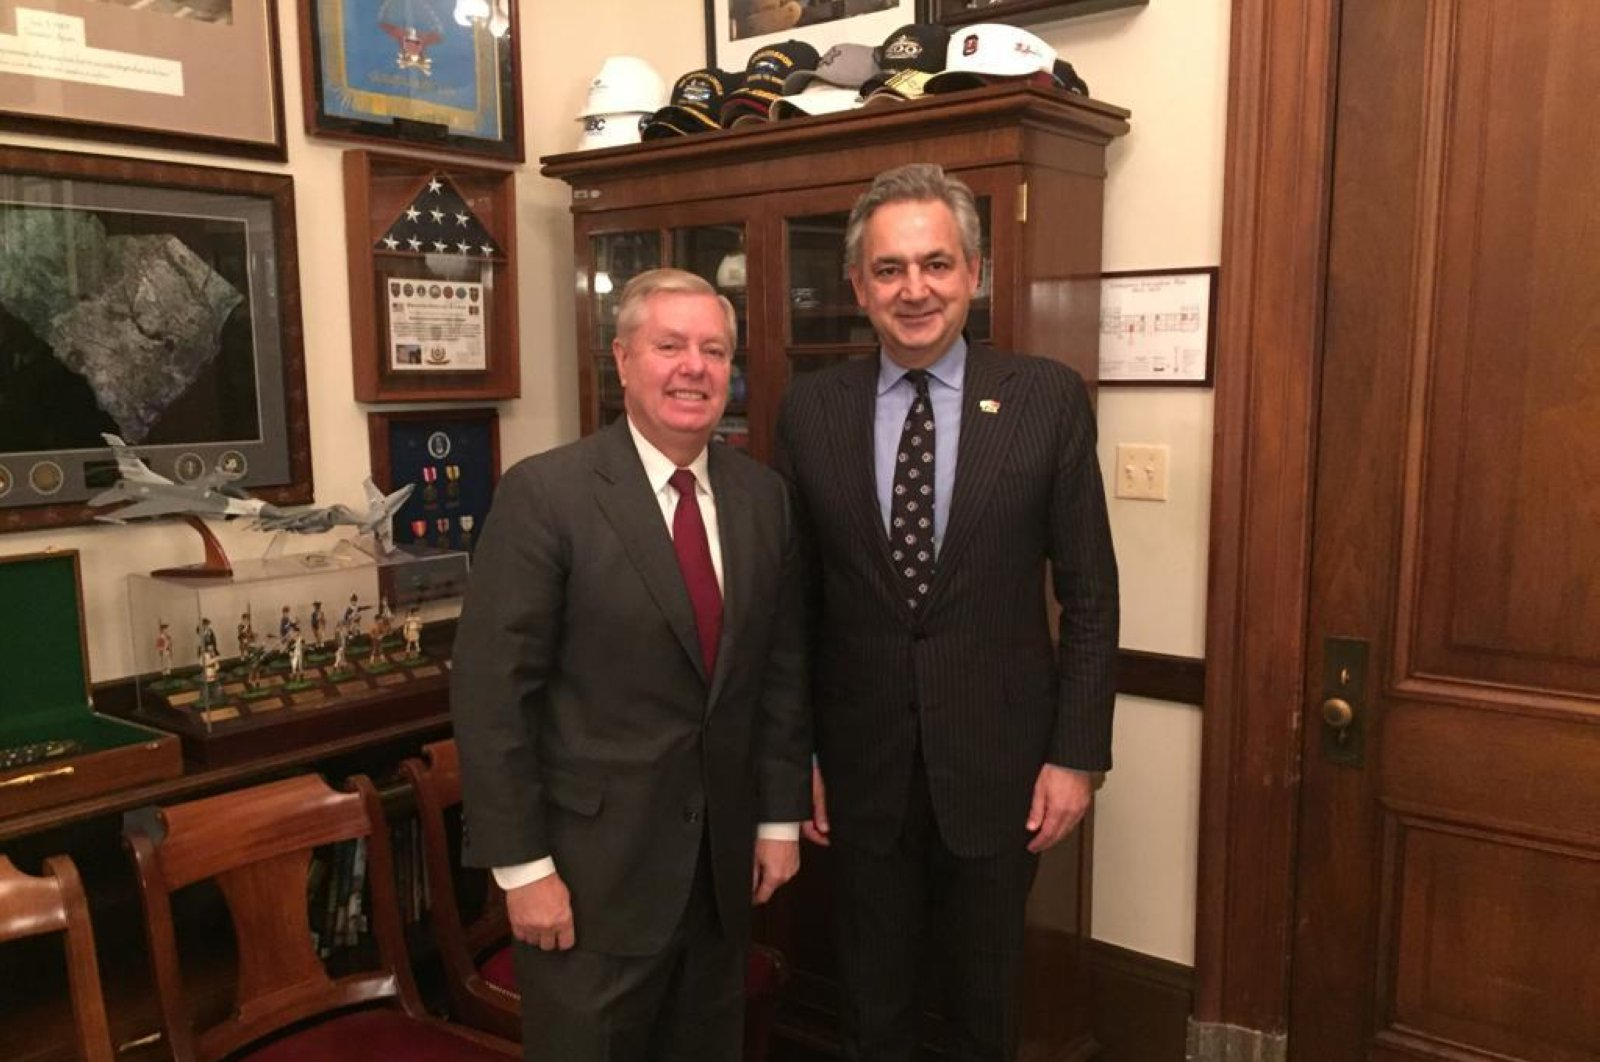 U.S. Senator Lindsey Graham of South Carolina (L) and TAIK Chairman Mehmet Ali Yalçındağ at Capitol Hill, Washington, D.C. (Courtesy of TAIK)